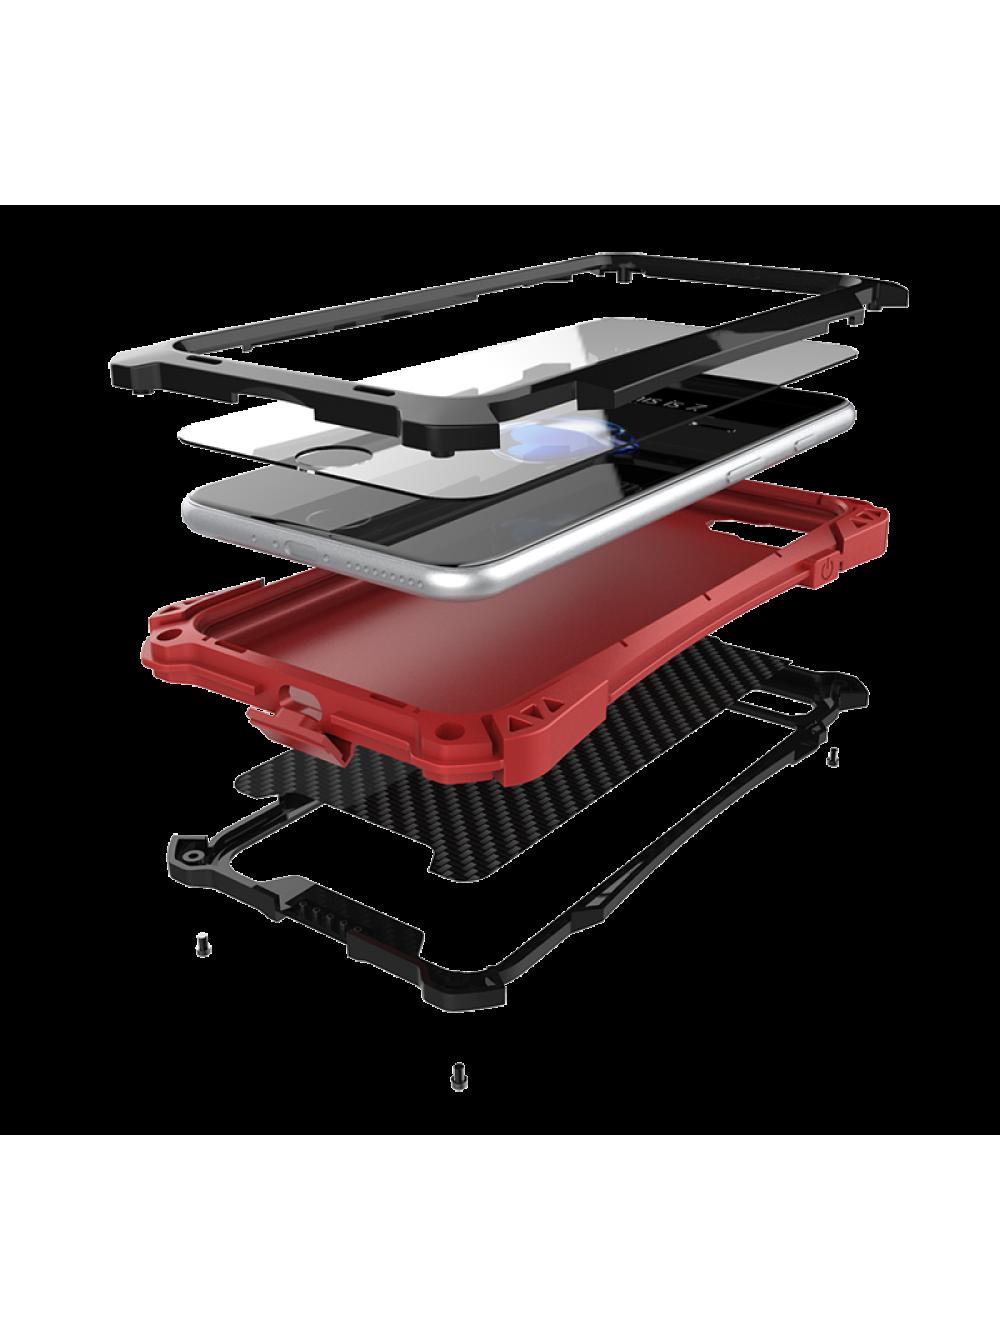 Чехол противоударный R-Just Amira милитари на iPhone 7 — Мощный Бампер